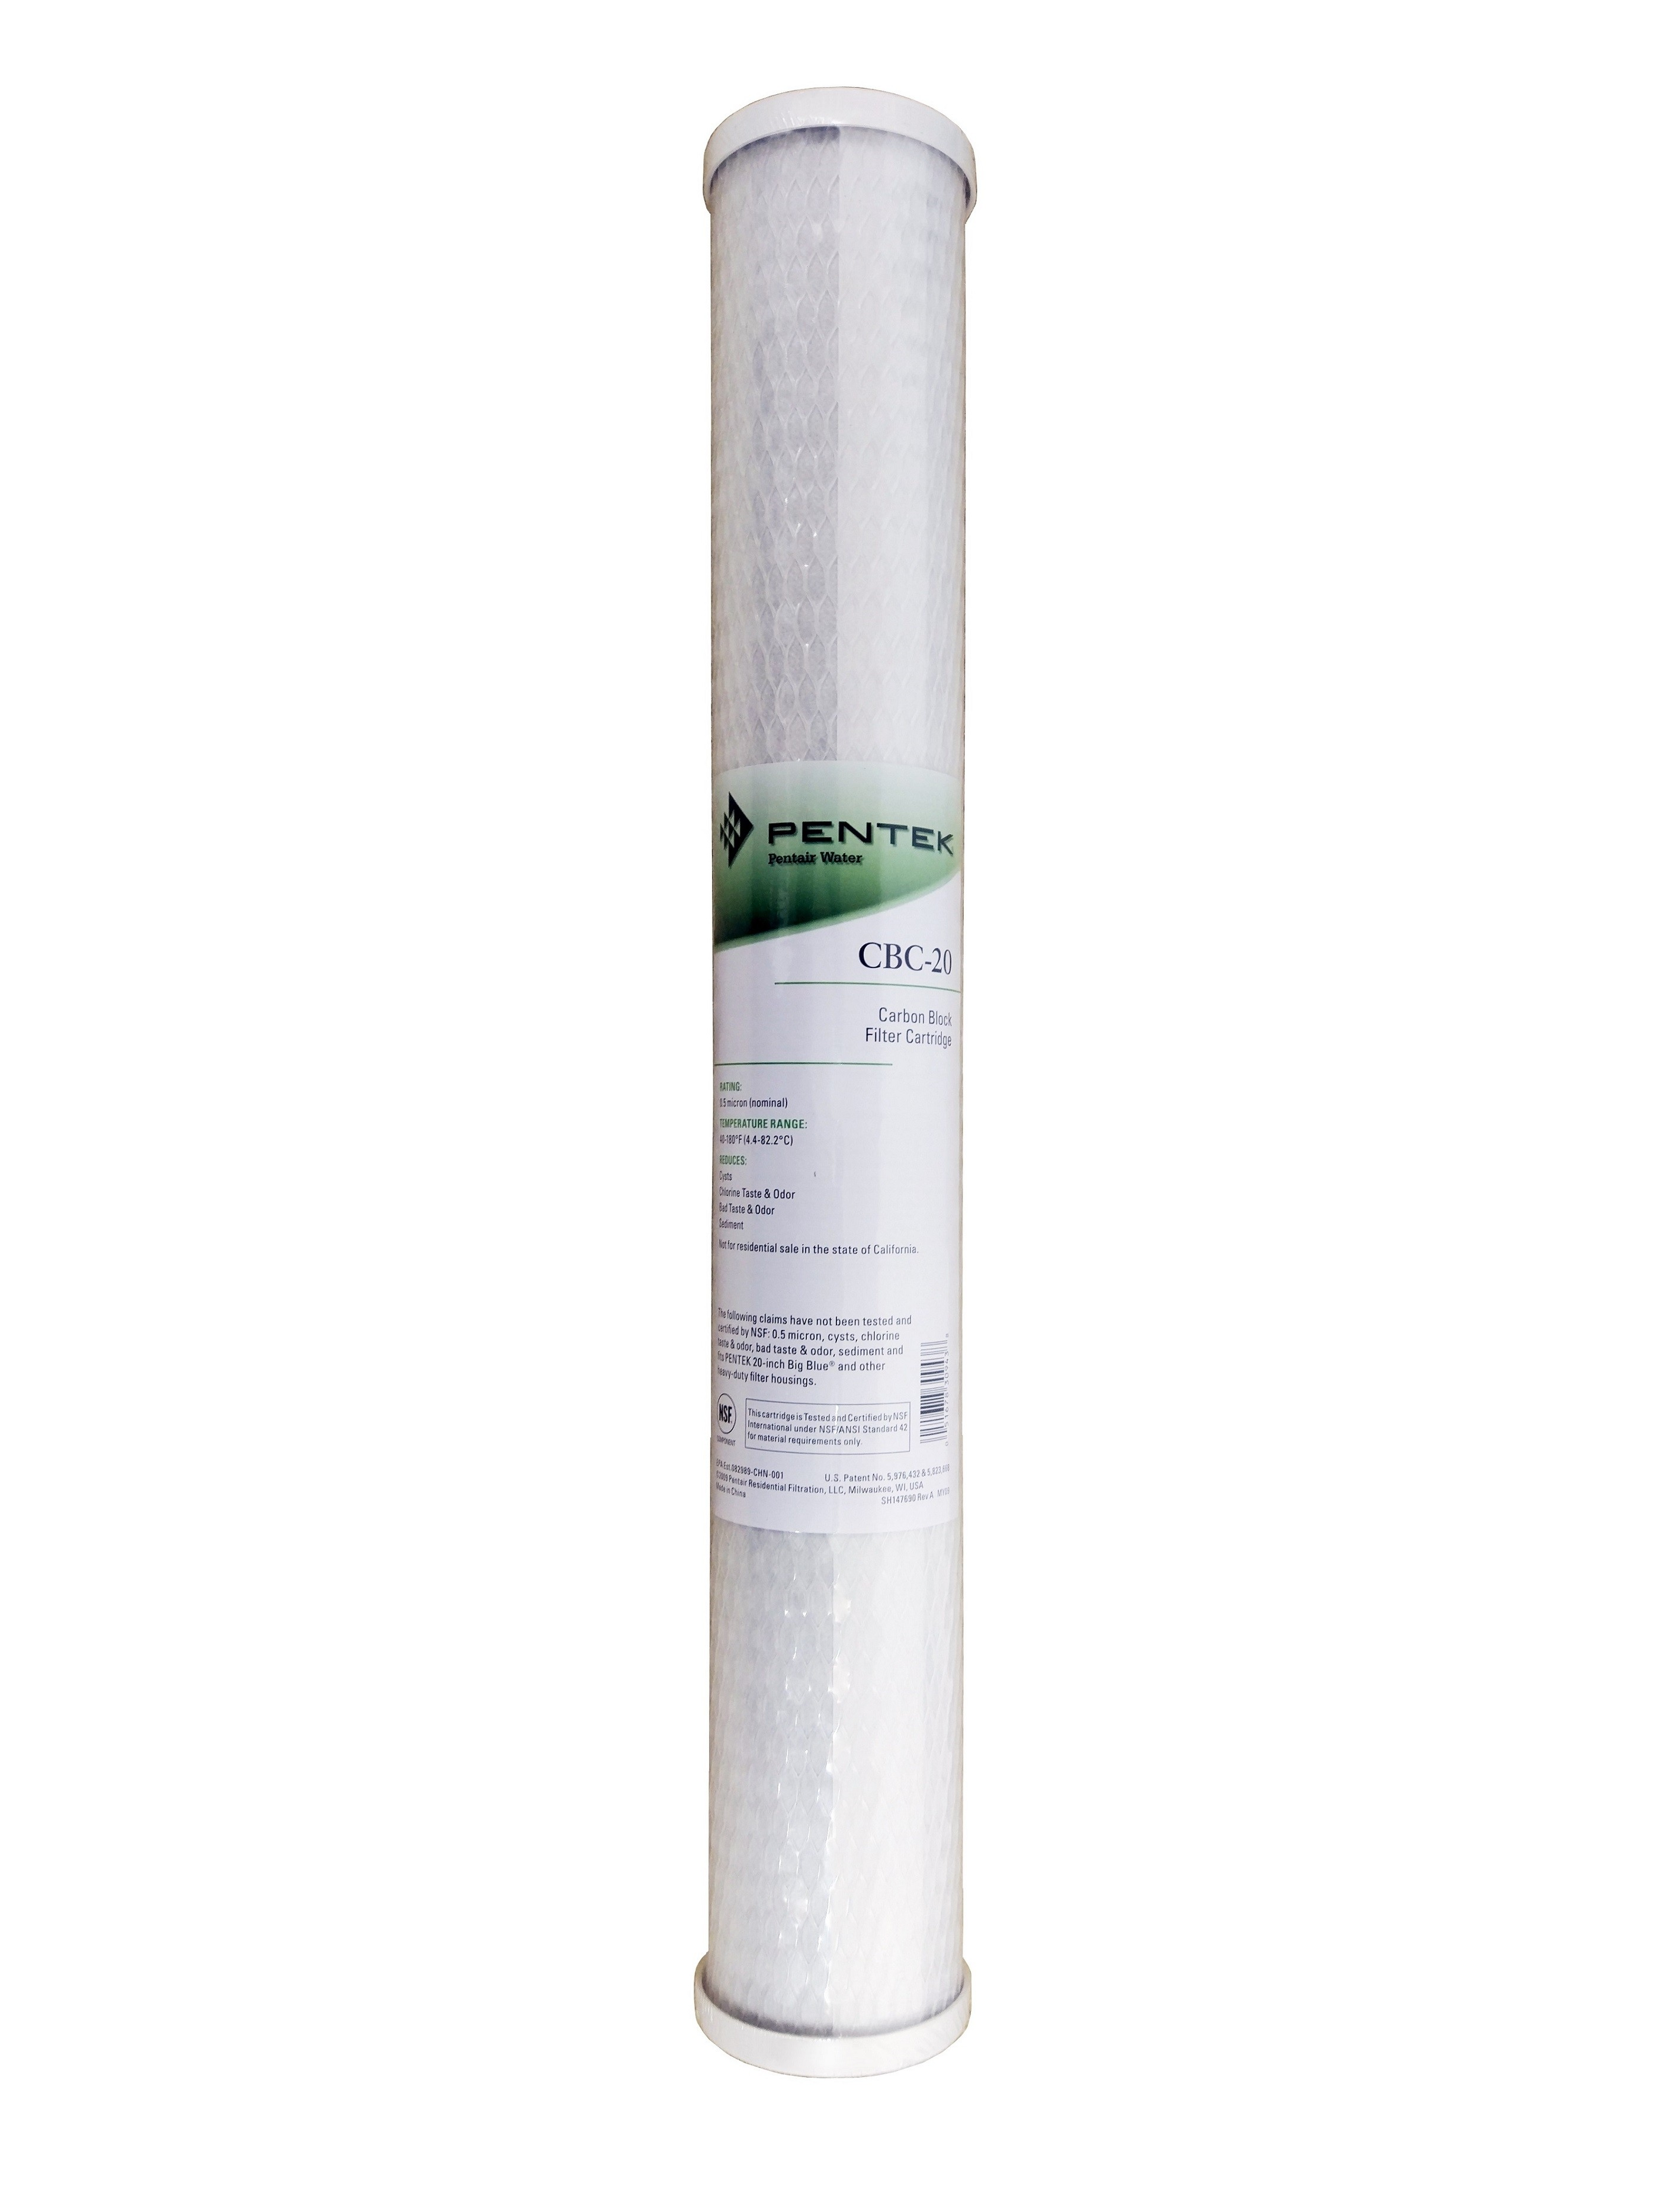 "Pentek CBC 20"" 0.5 Micron Carbon Block Water Filter"